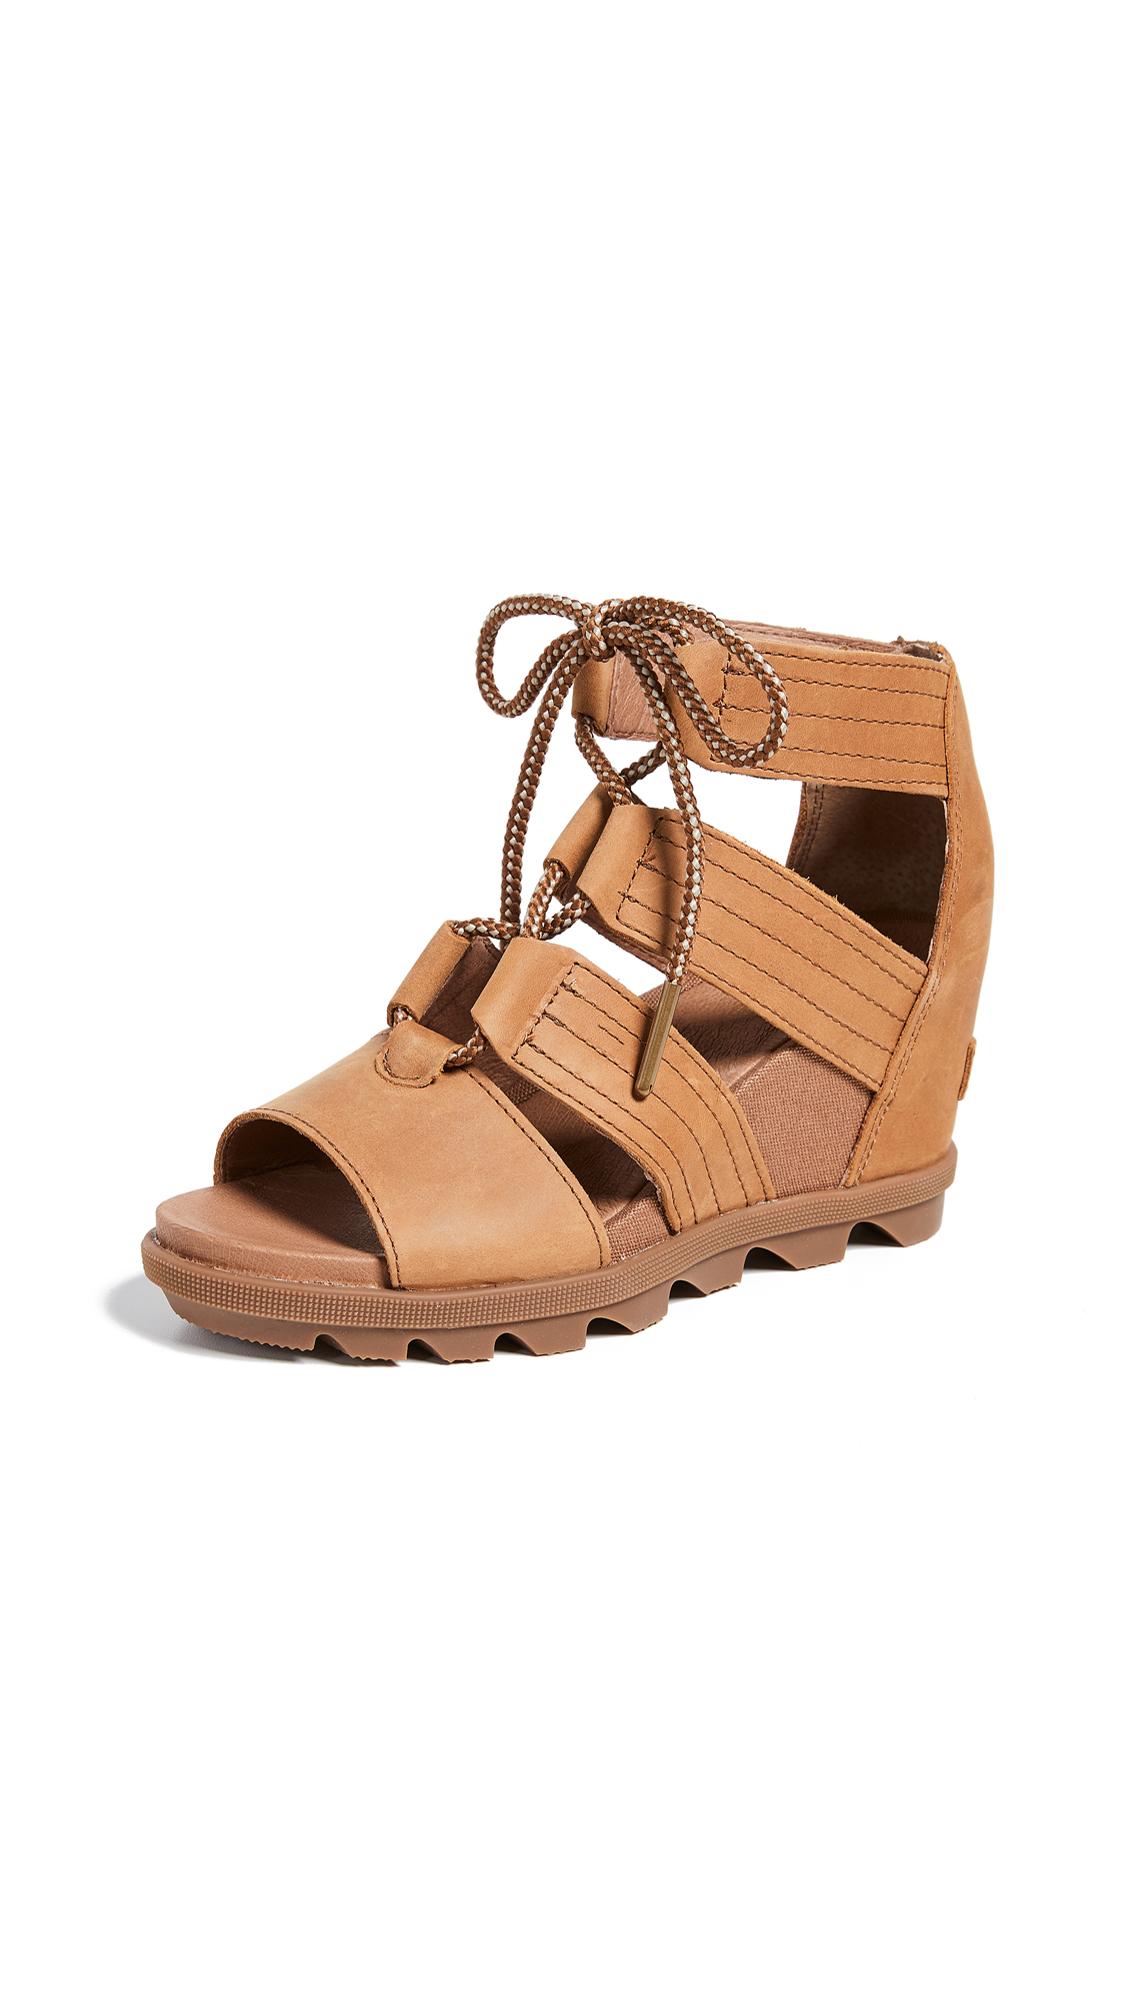 Sorel Joanie II Lace Wedge Sandals - Camel Brown